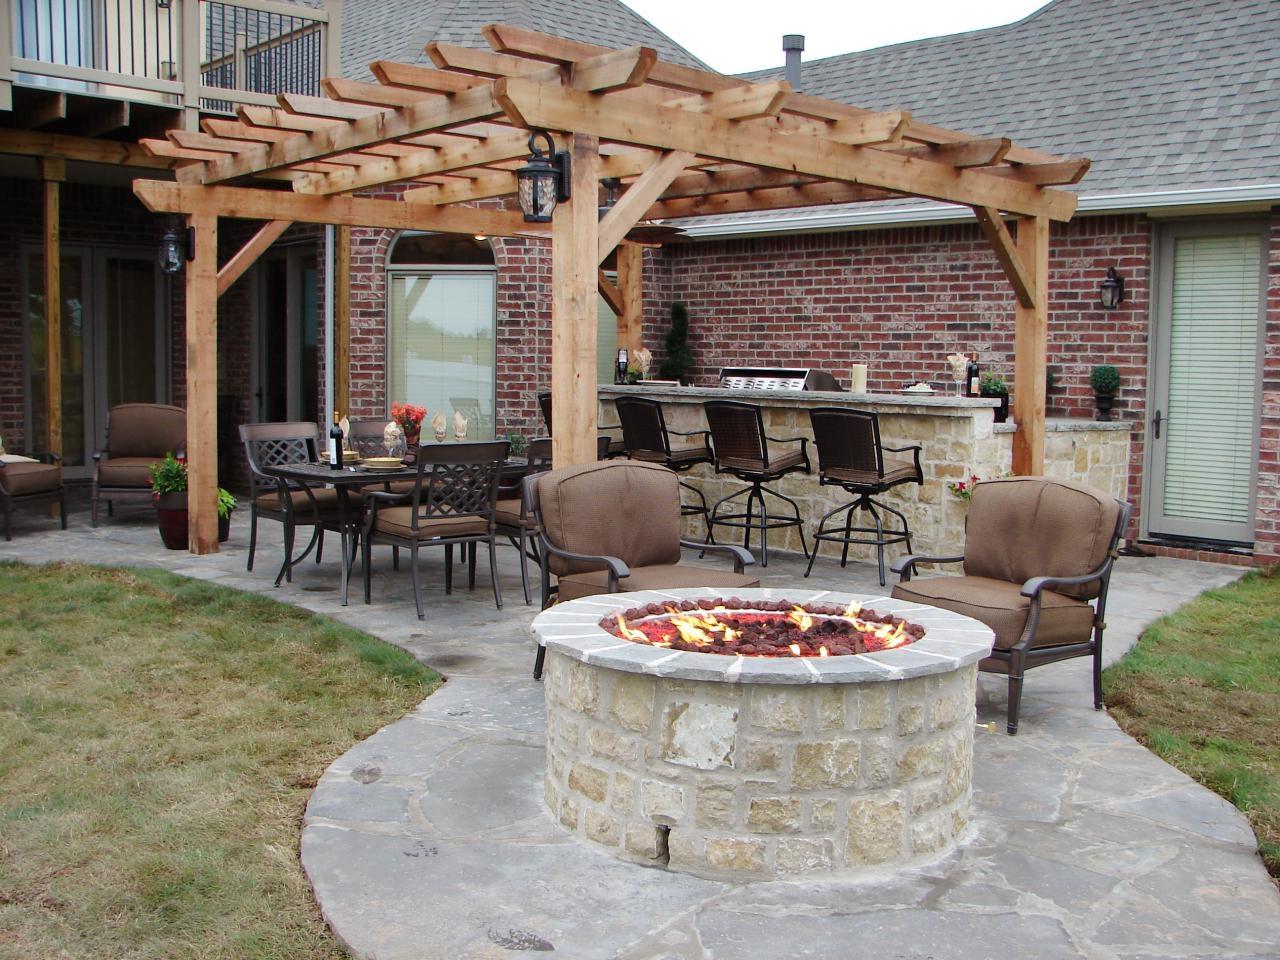 outdoor patio fireplace ideas outdoor patio fireplace ideas lovely 66 fire pit and outdoor fireplace ideas